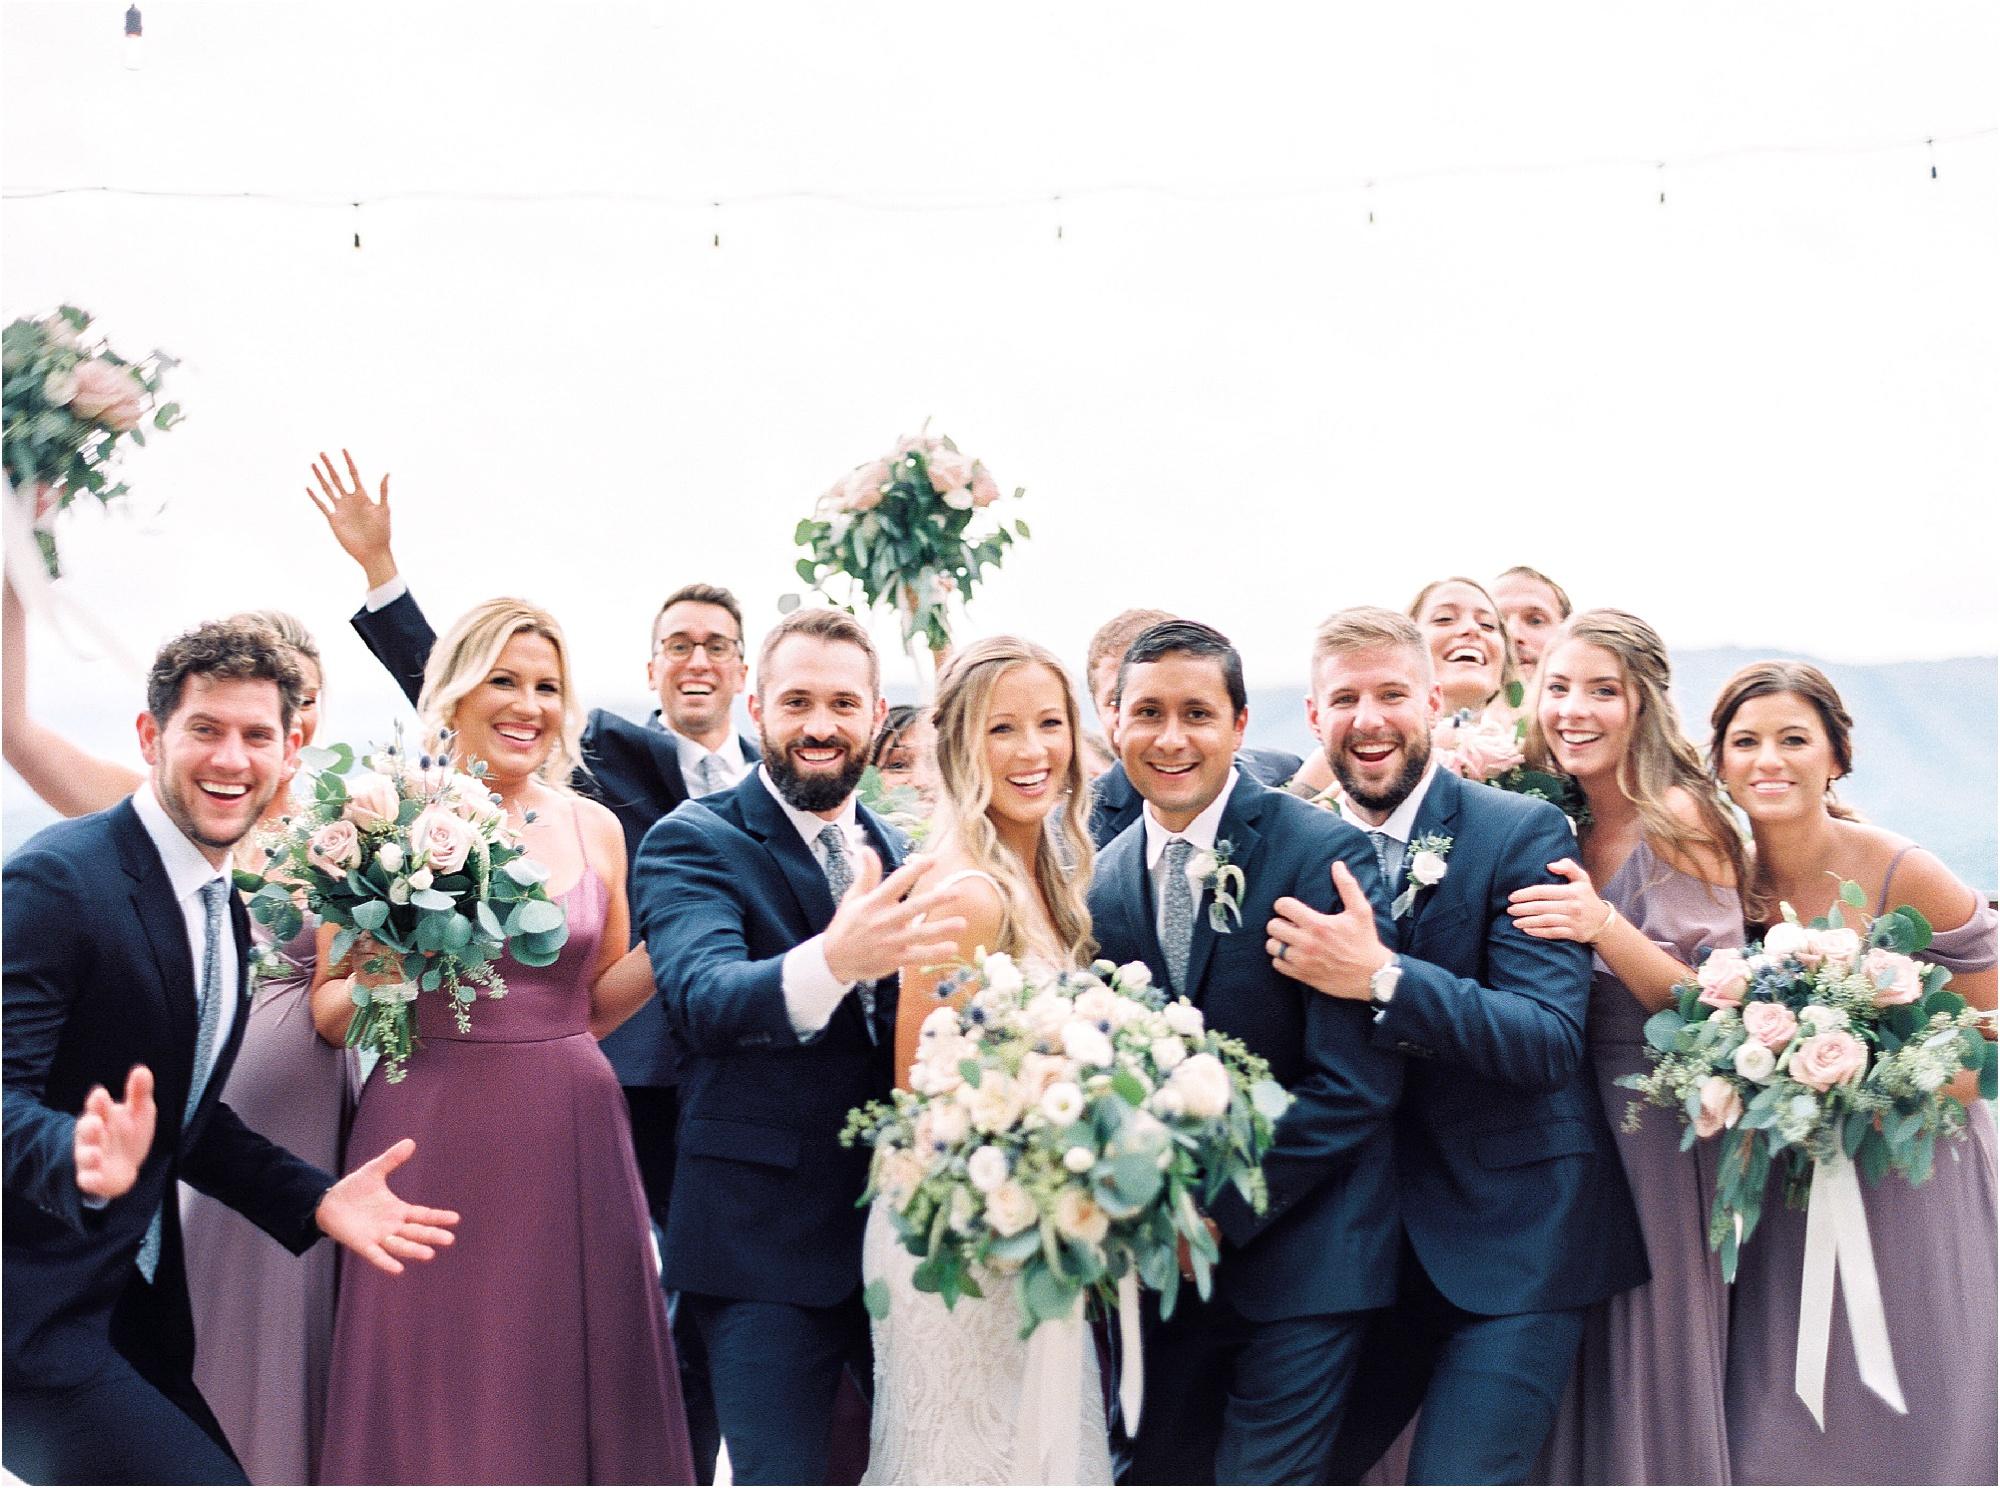 bride, groom, and groomsmen group photos